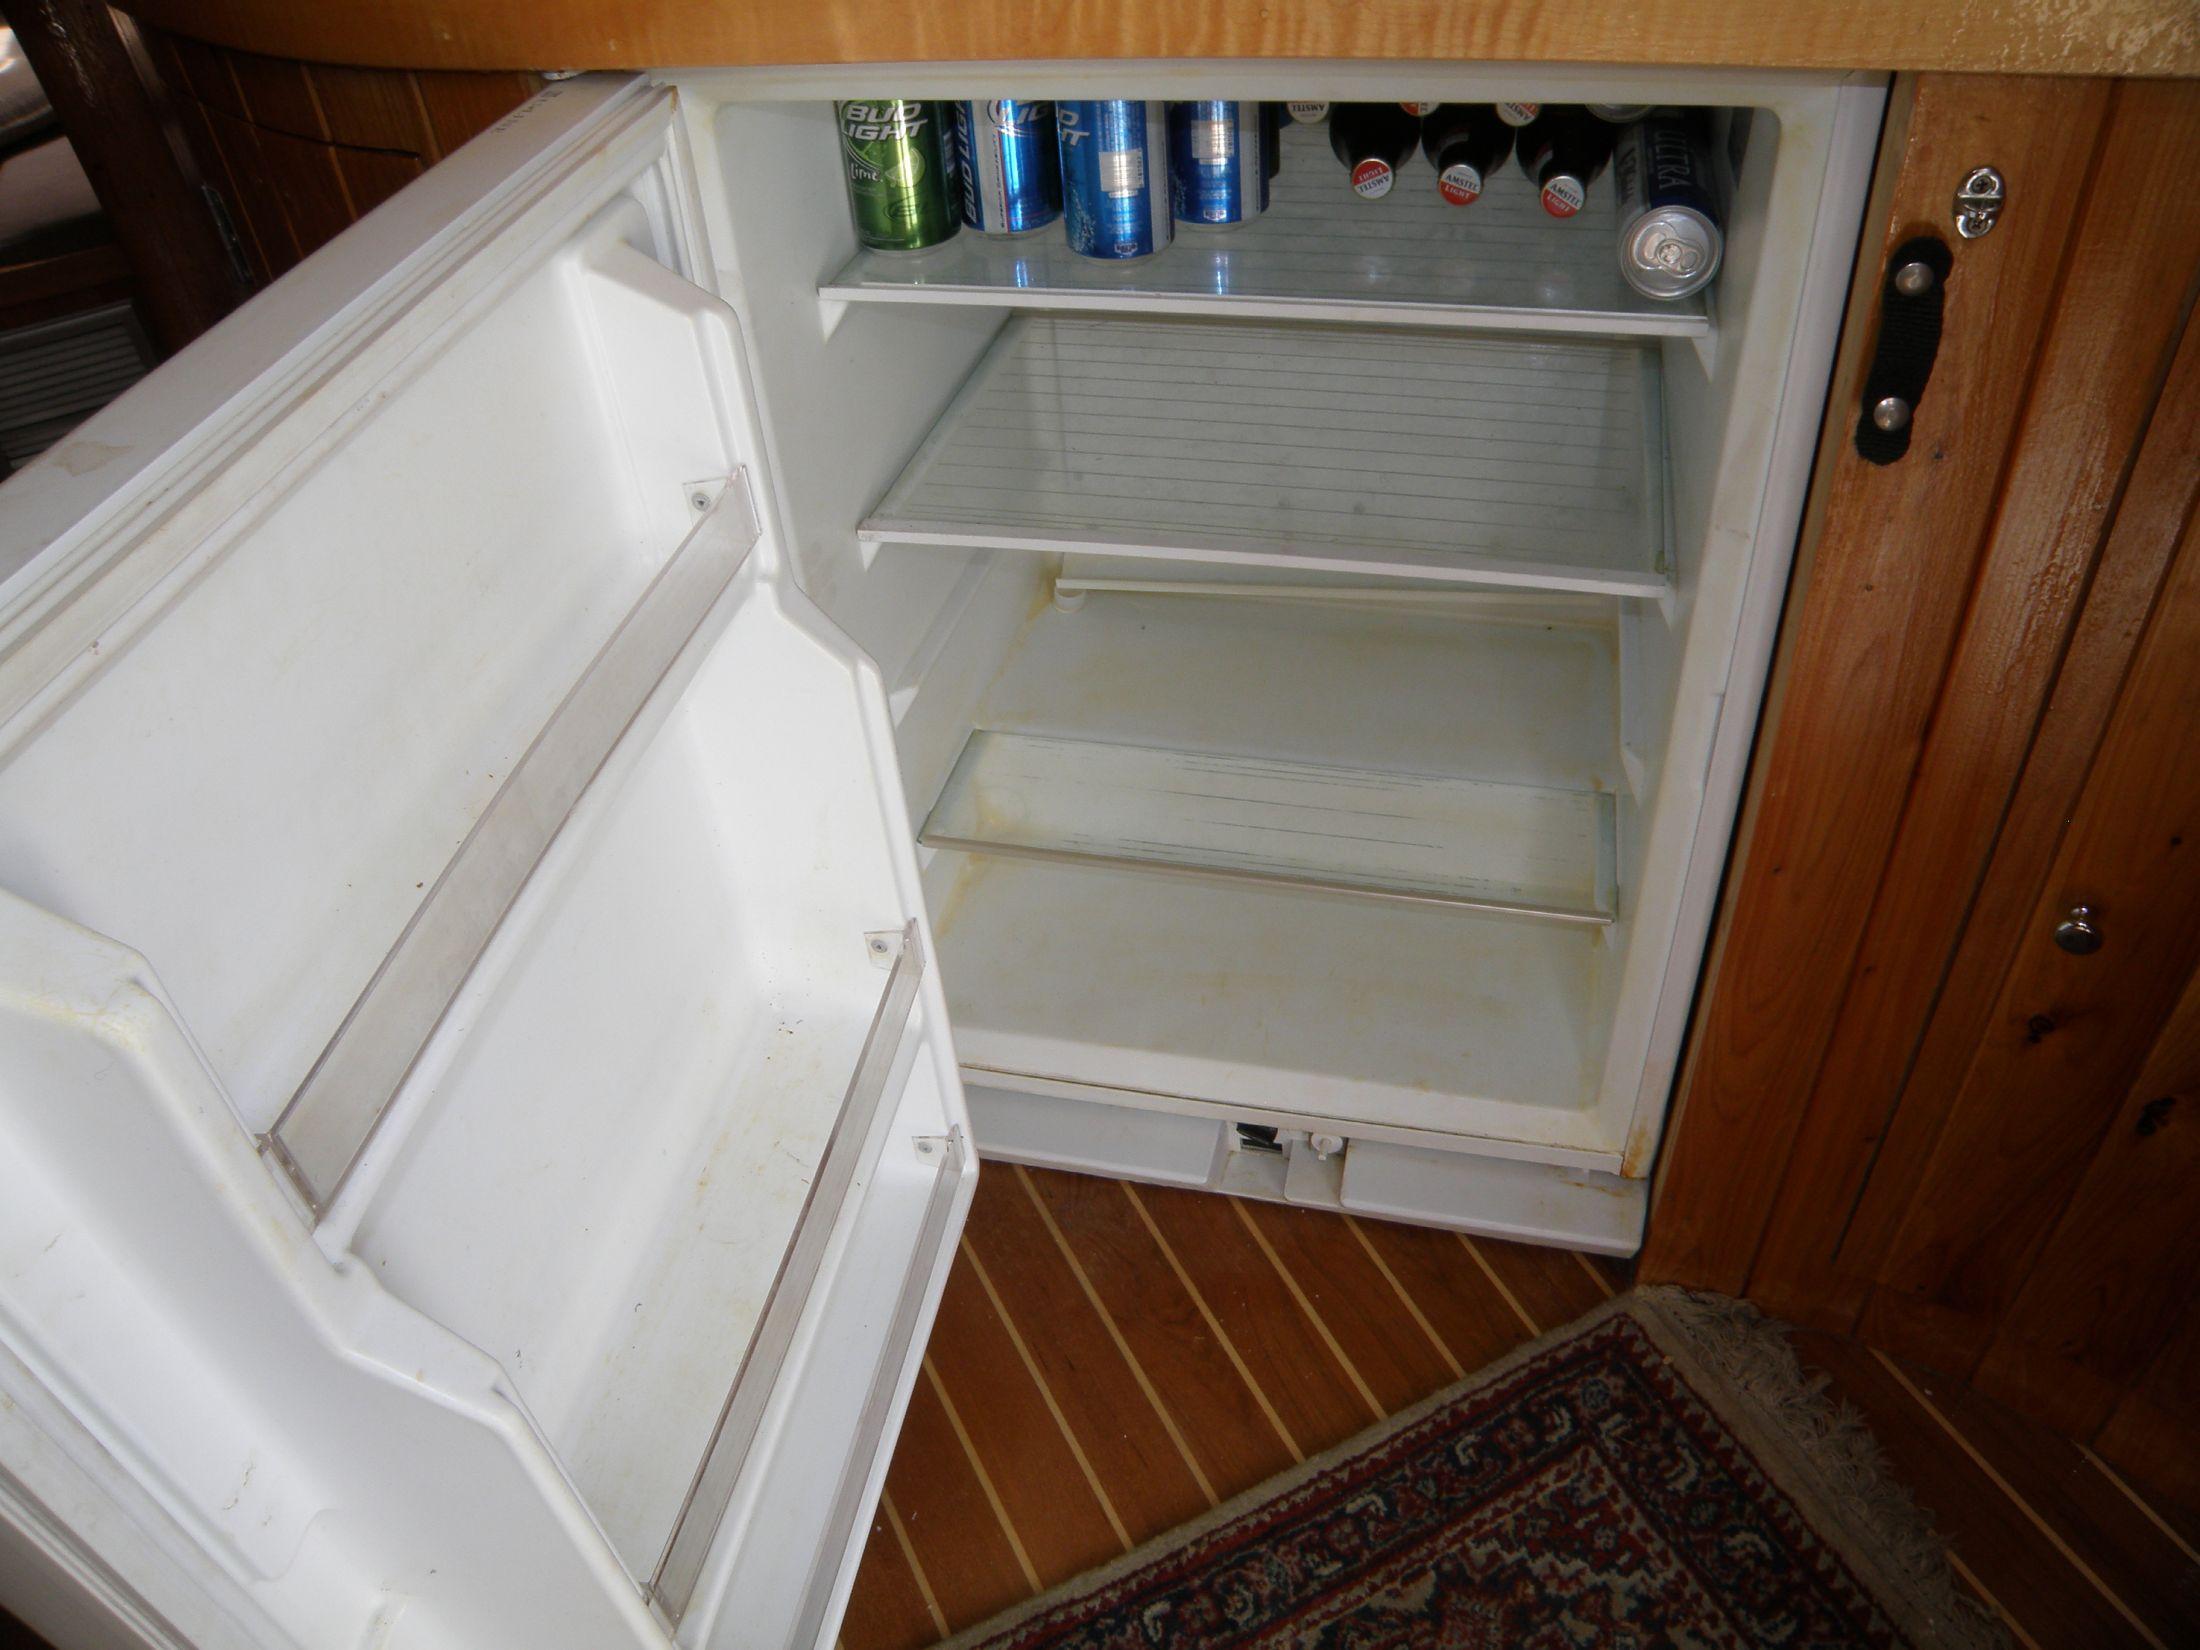 Uline refrigerator